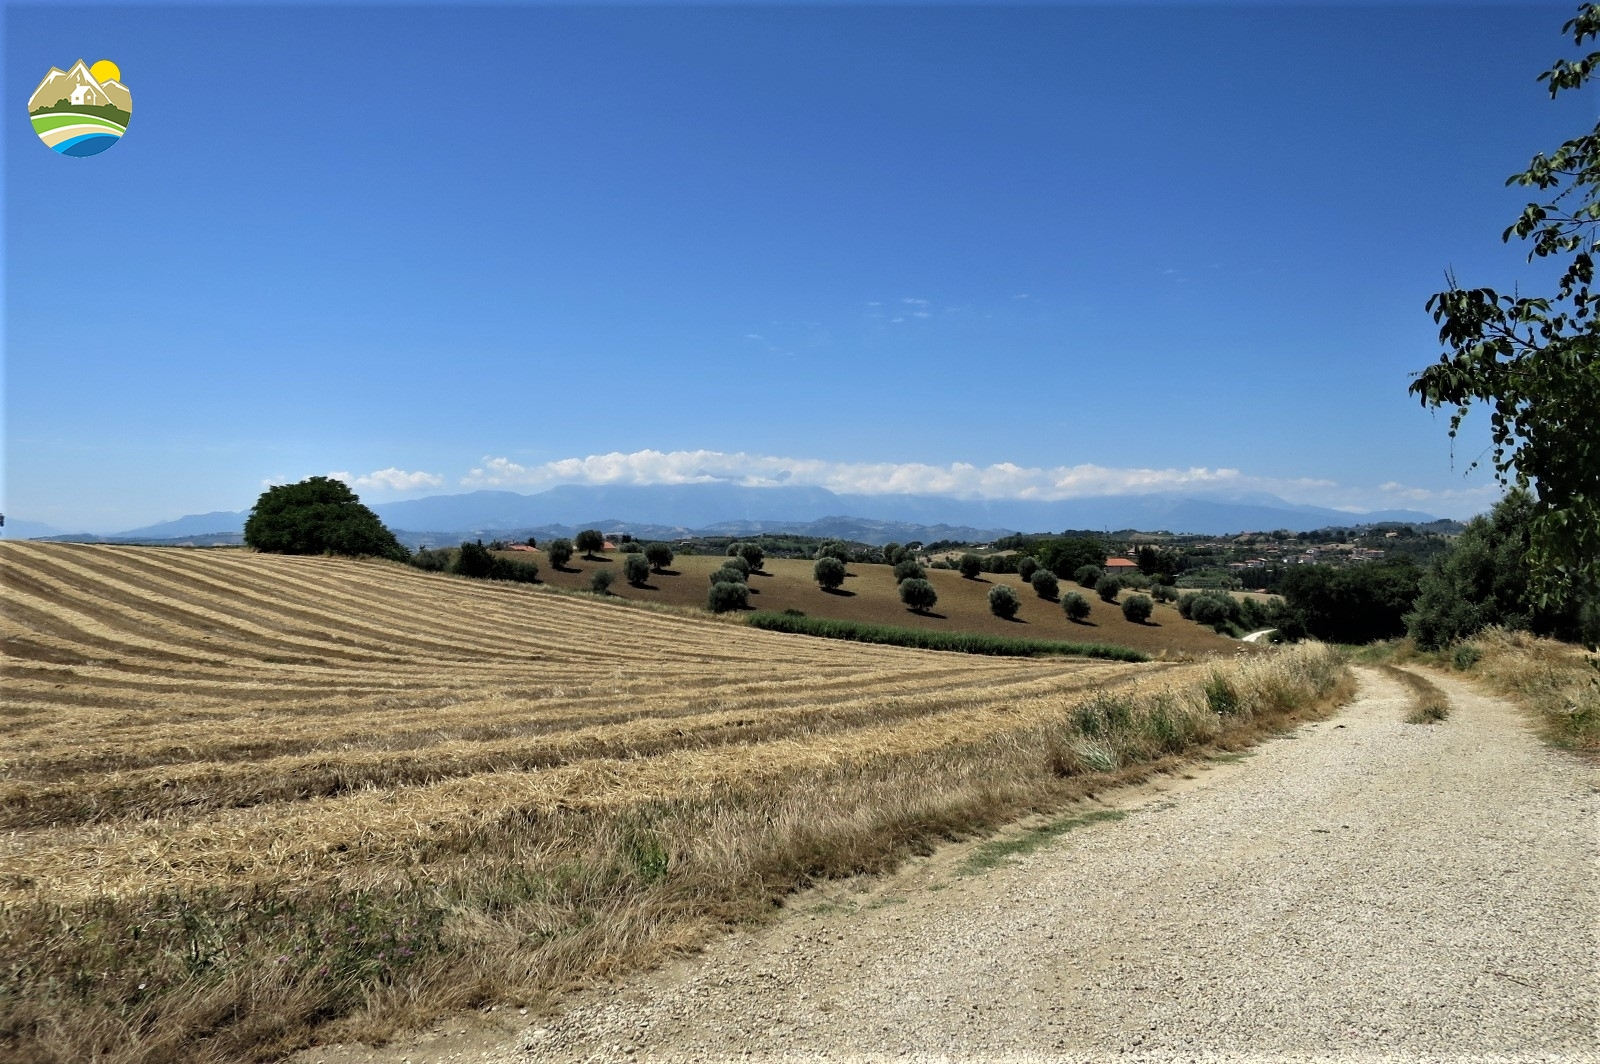 Country Houses Country Houses for sale Morro D'Oro (TE), Casa del Moro - Morro D'Oro - EUR 327.141 690